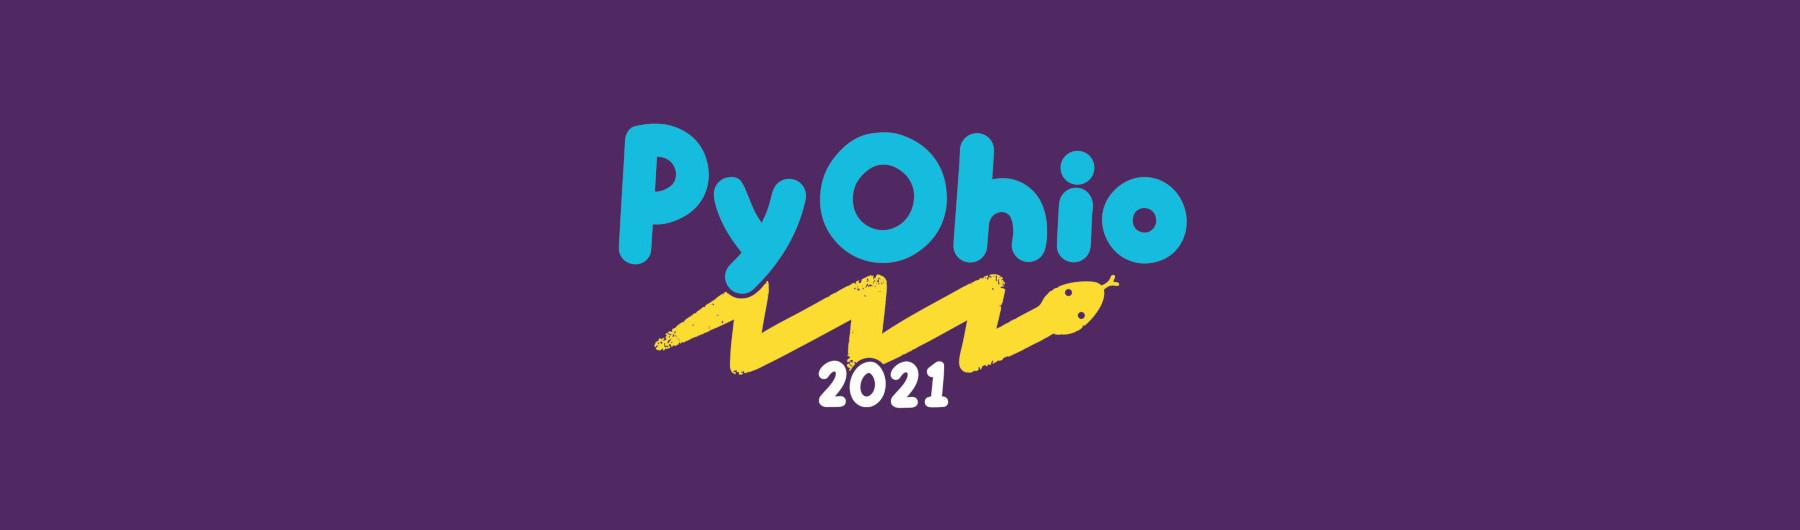 PyOhio 2021